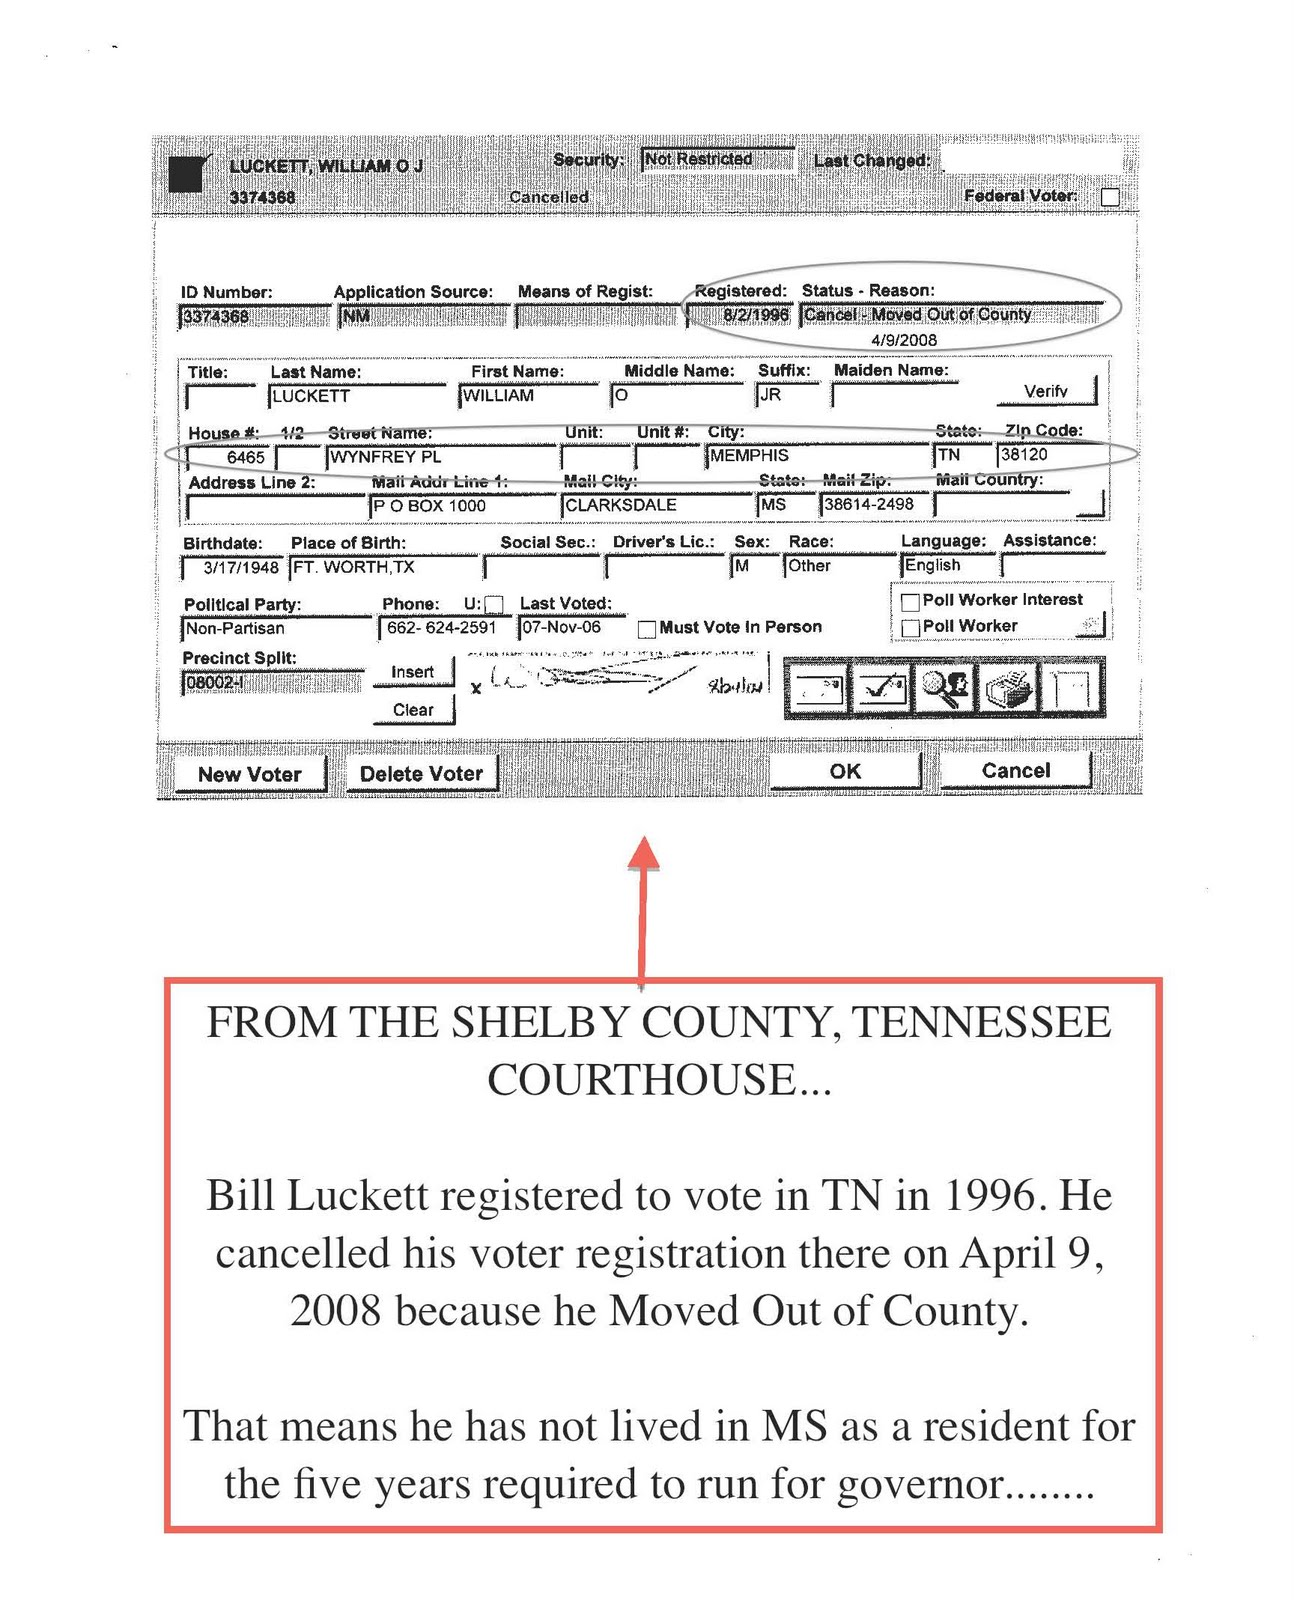 Free Resume 2018 » vehicle registration clarksville tn | Free Resume